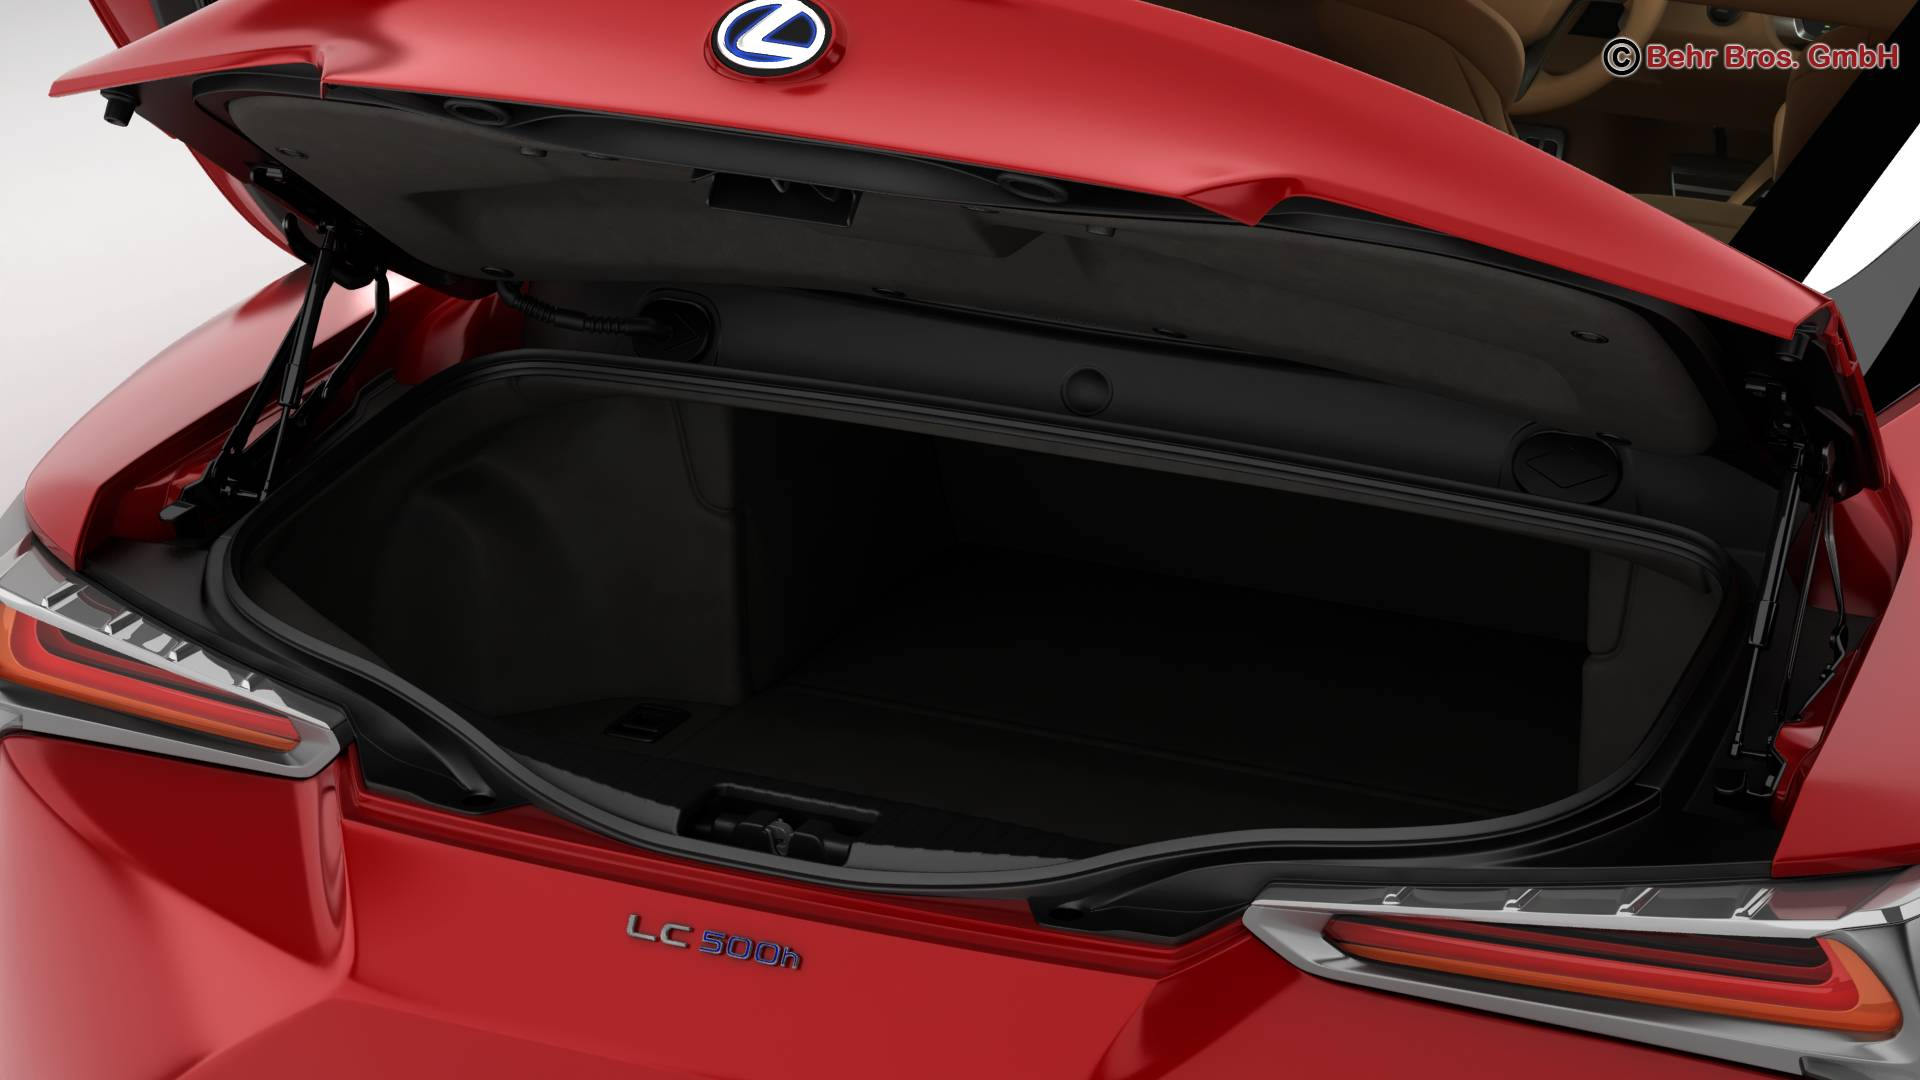 lexus lc 500 us hybrid 2018 3d model 3ds max fbx c4d lwo ma mb obj 267938